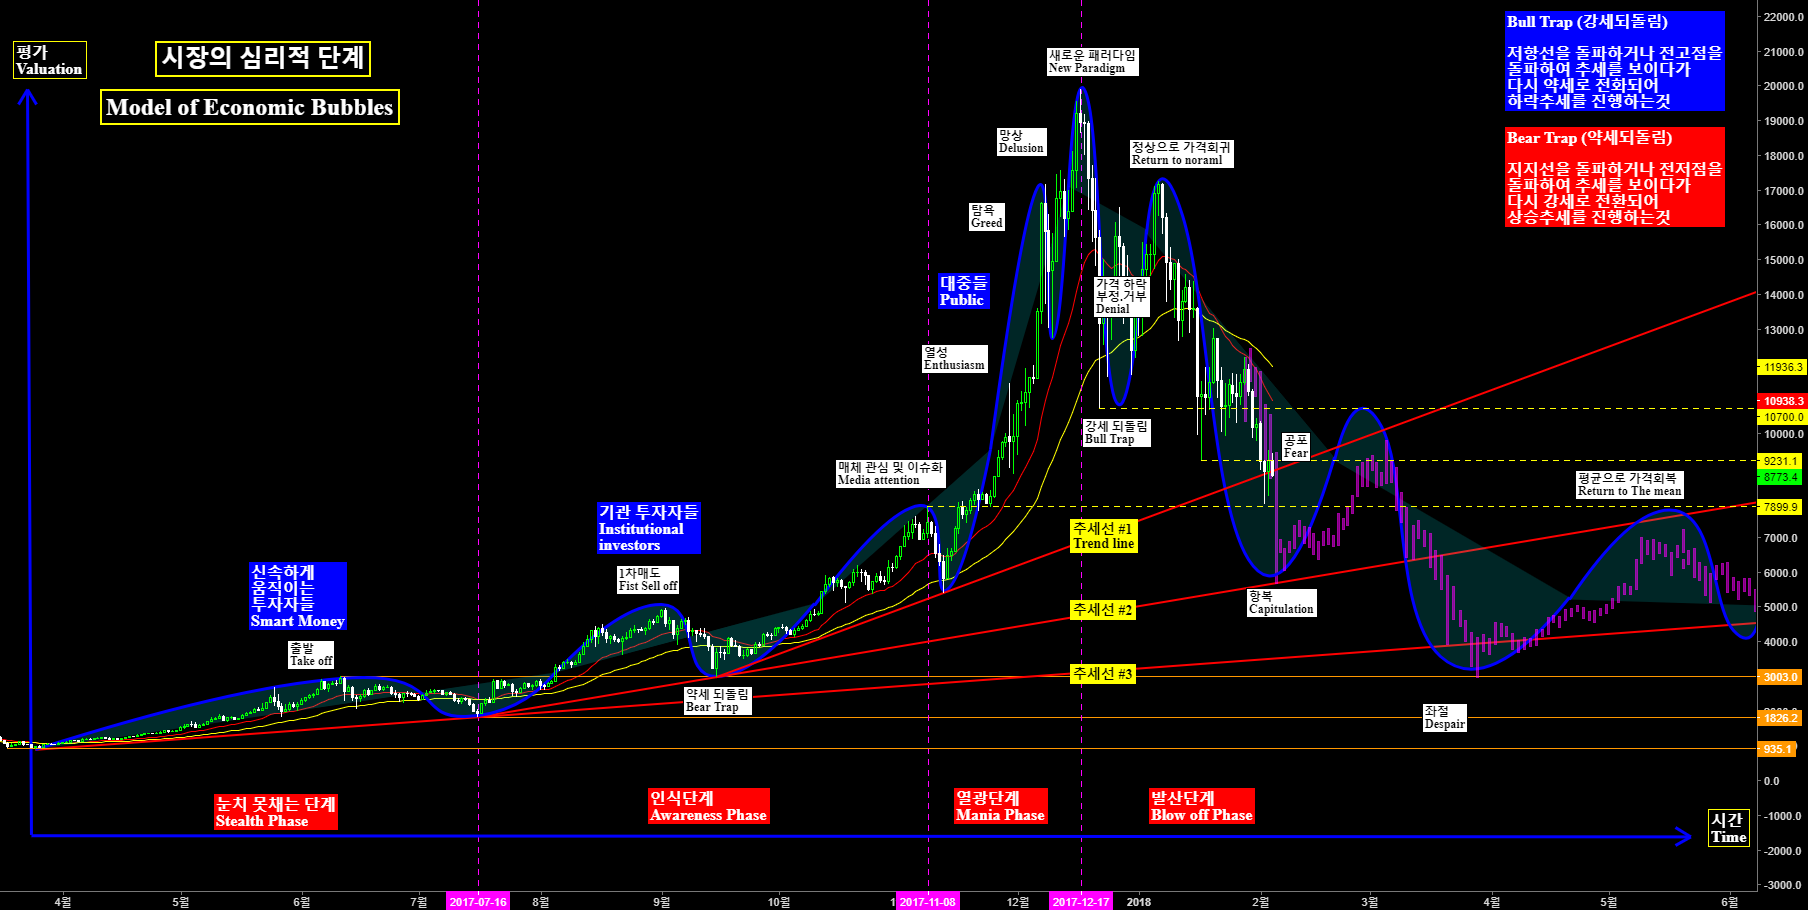 BTCUSD / Bitcoin / 시장의 심리적 단계 Model of Economic Bubbles (방심은 금물)